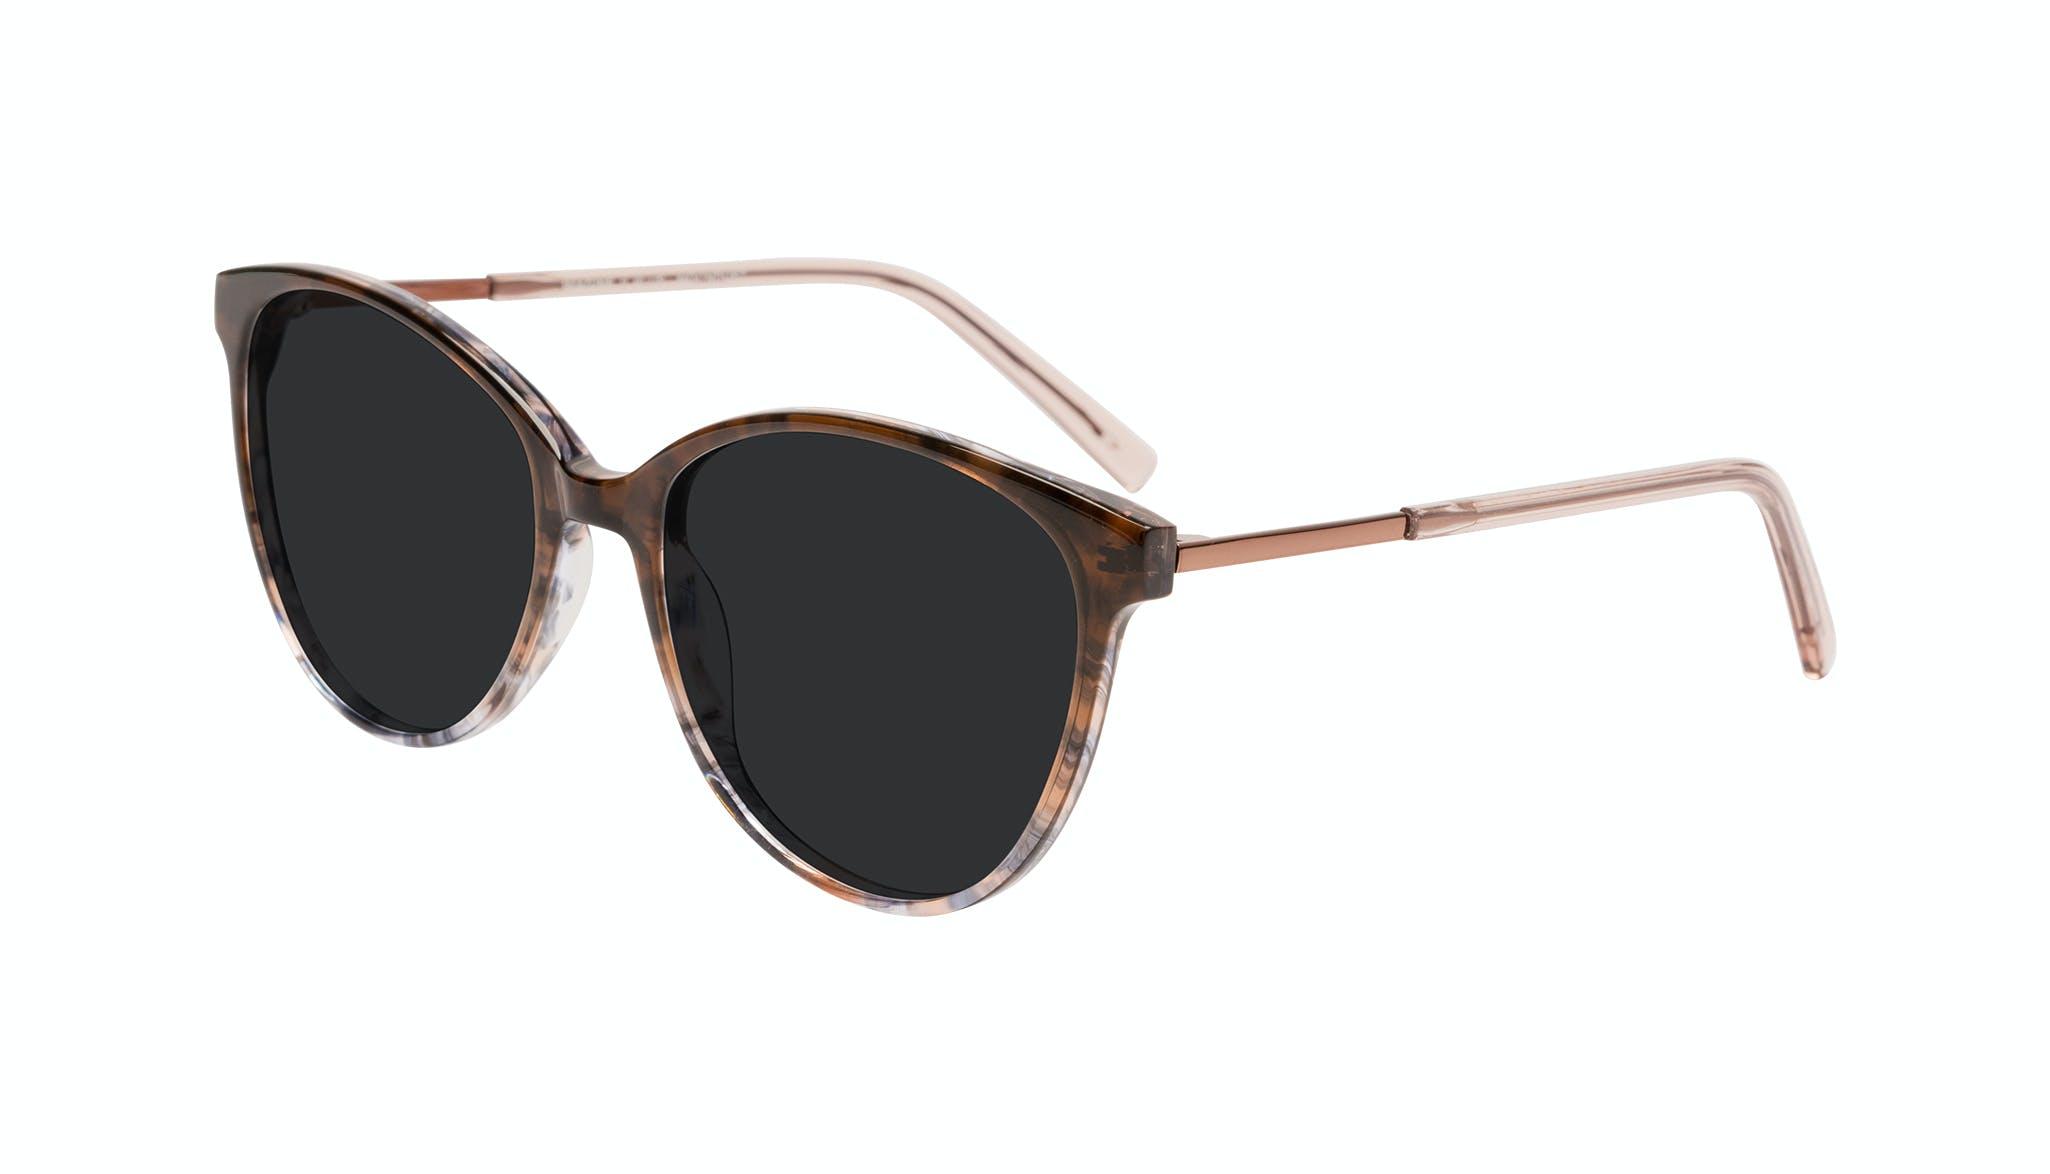 Affordable Fashion Glasses Cat Eye Sunglasses Women Imagine II Plus Moondust Tilt